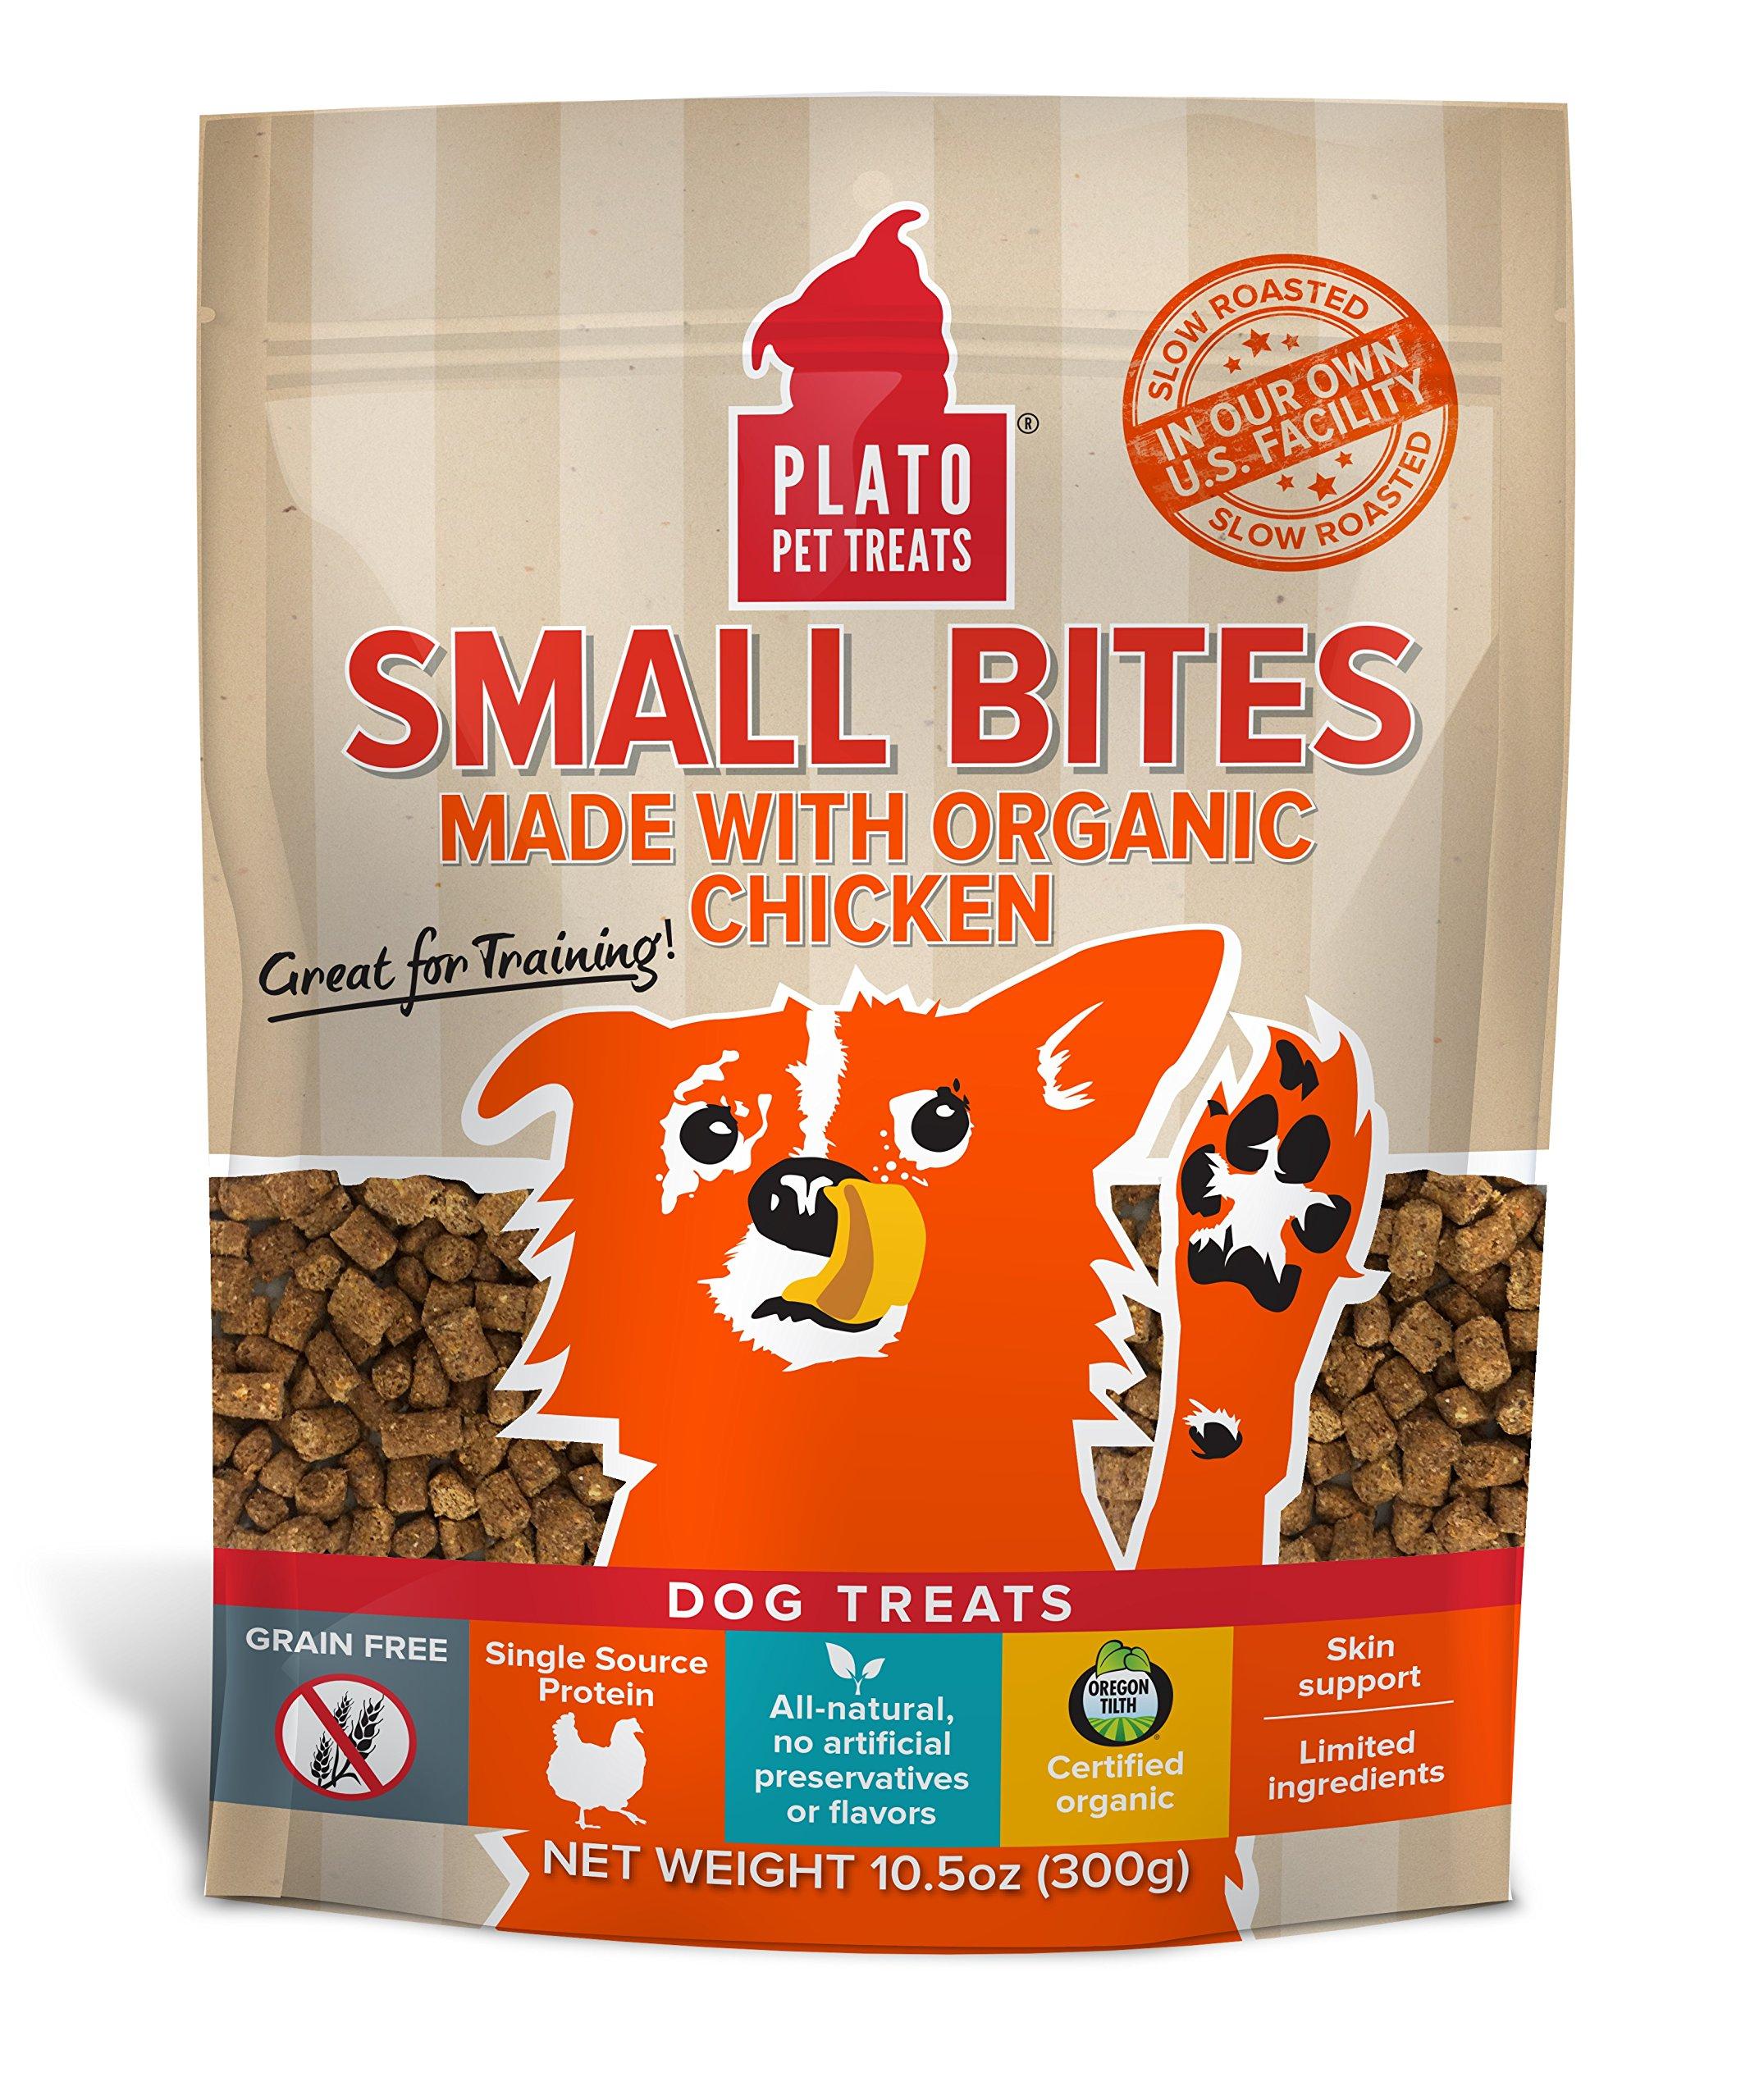 PLATO Dog Treats - Organic Chicken - Pet Treats, All-Natural, Non-GMO, No Artificial Flavors, or Preservatives, Made in the USA